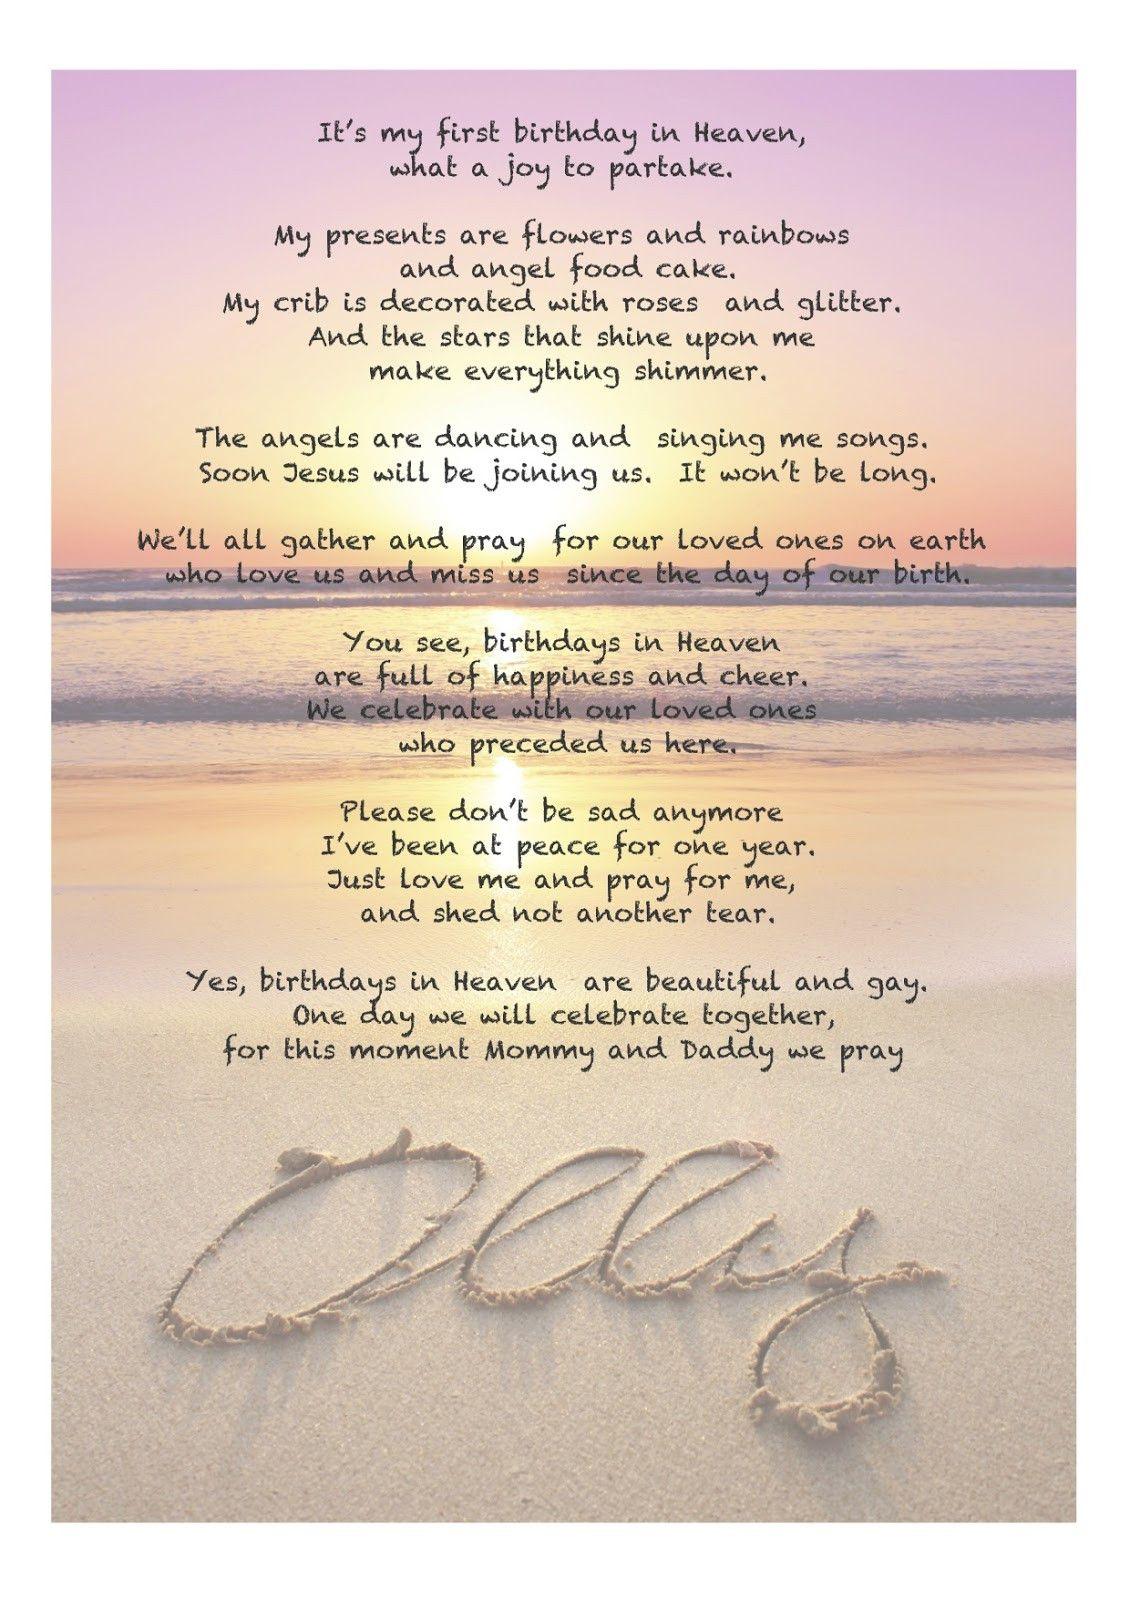 Birthday in heaven poem luxury birthday in heaven poems